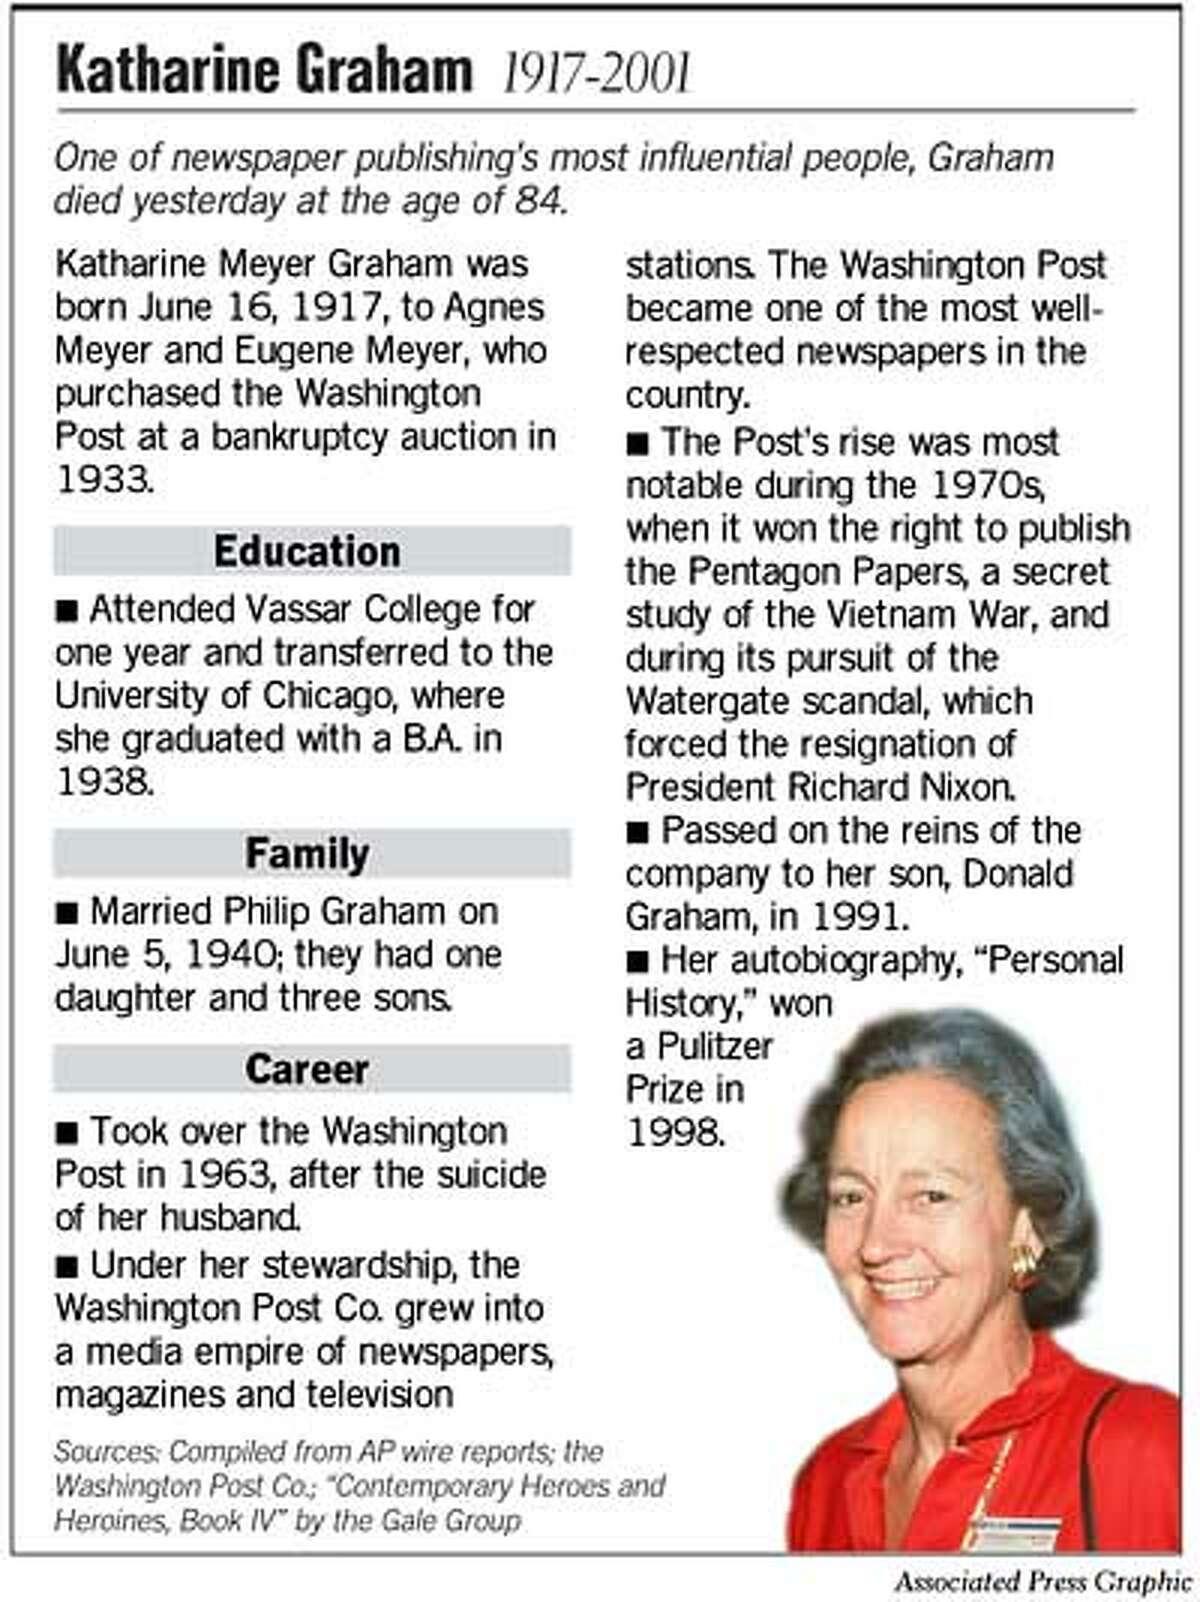 Katharine Graham 1917-2001. Associated Press Graphic